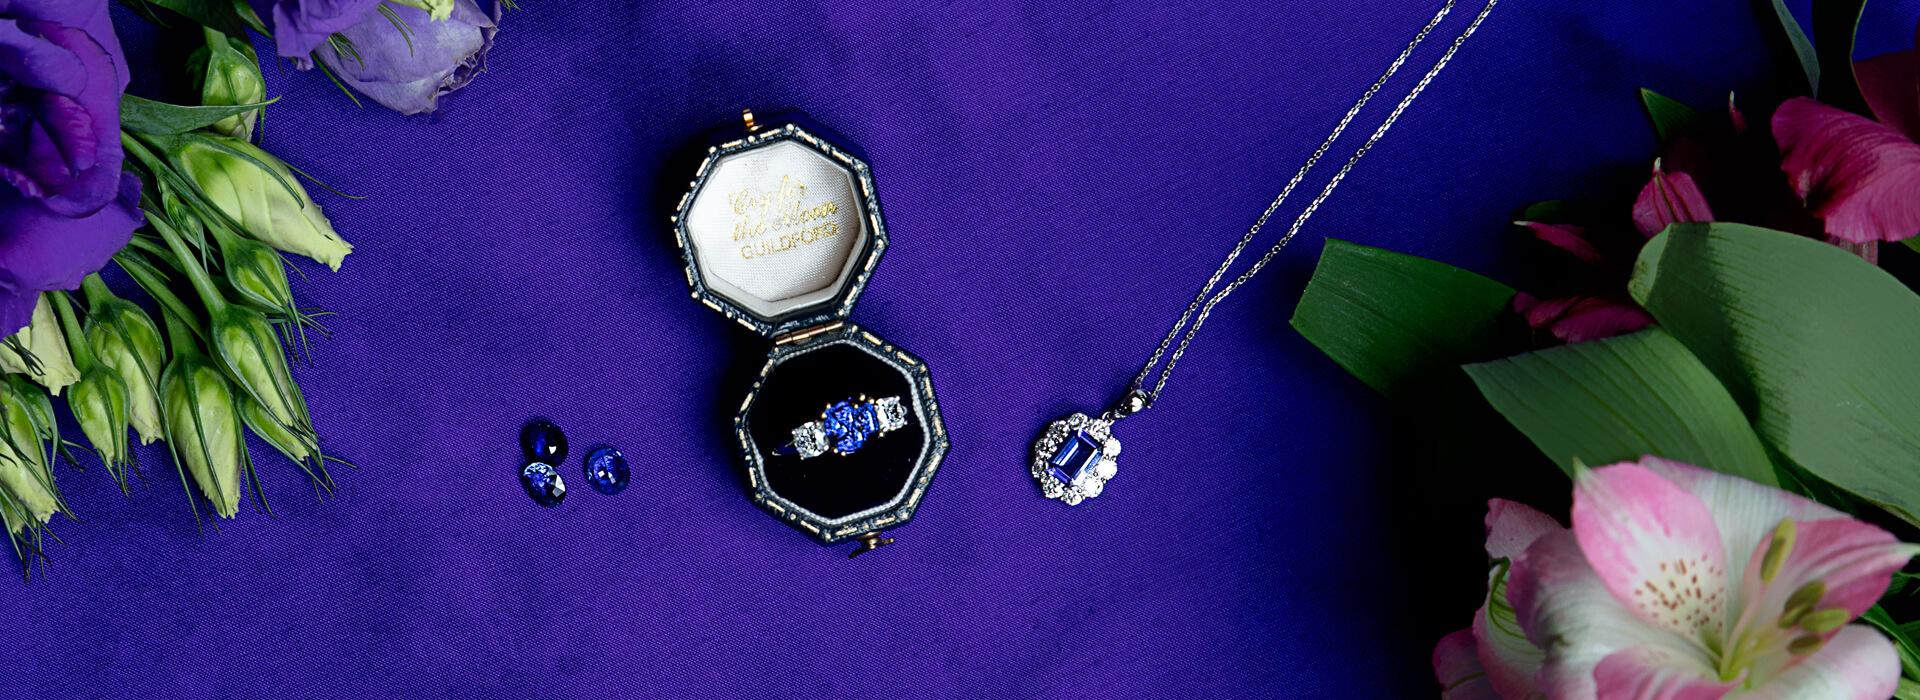 jewellery-sapphire